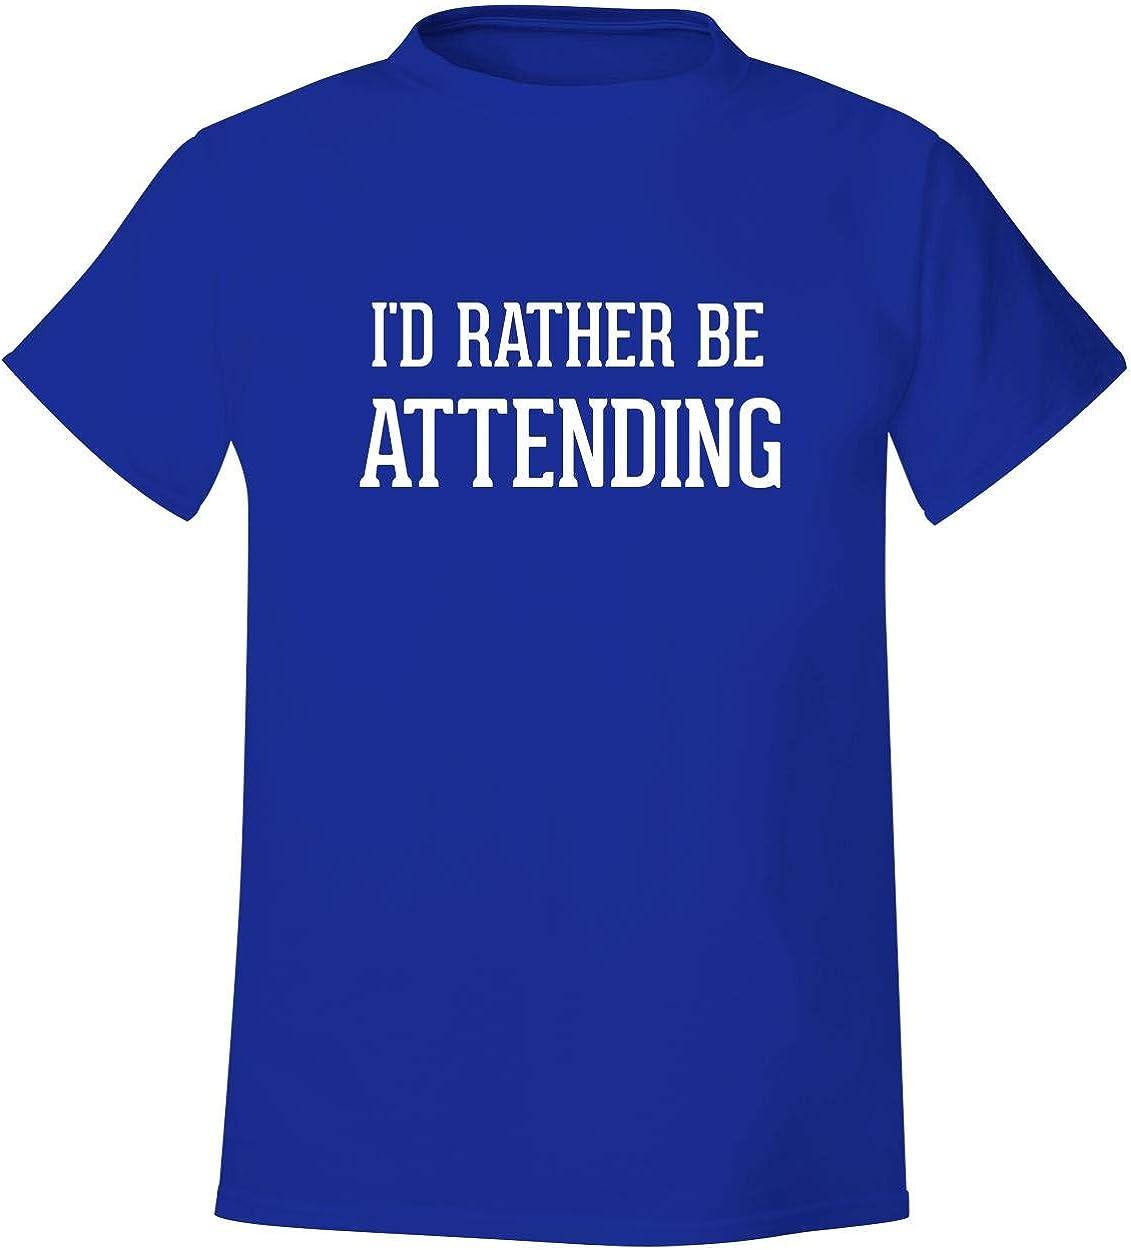 I'D Rather sein Attending - Men'S Soft & Comfortable T-Shirt